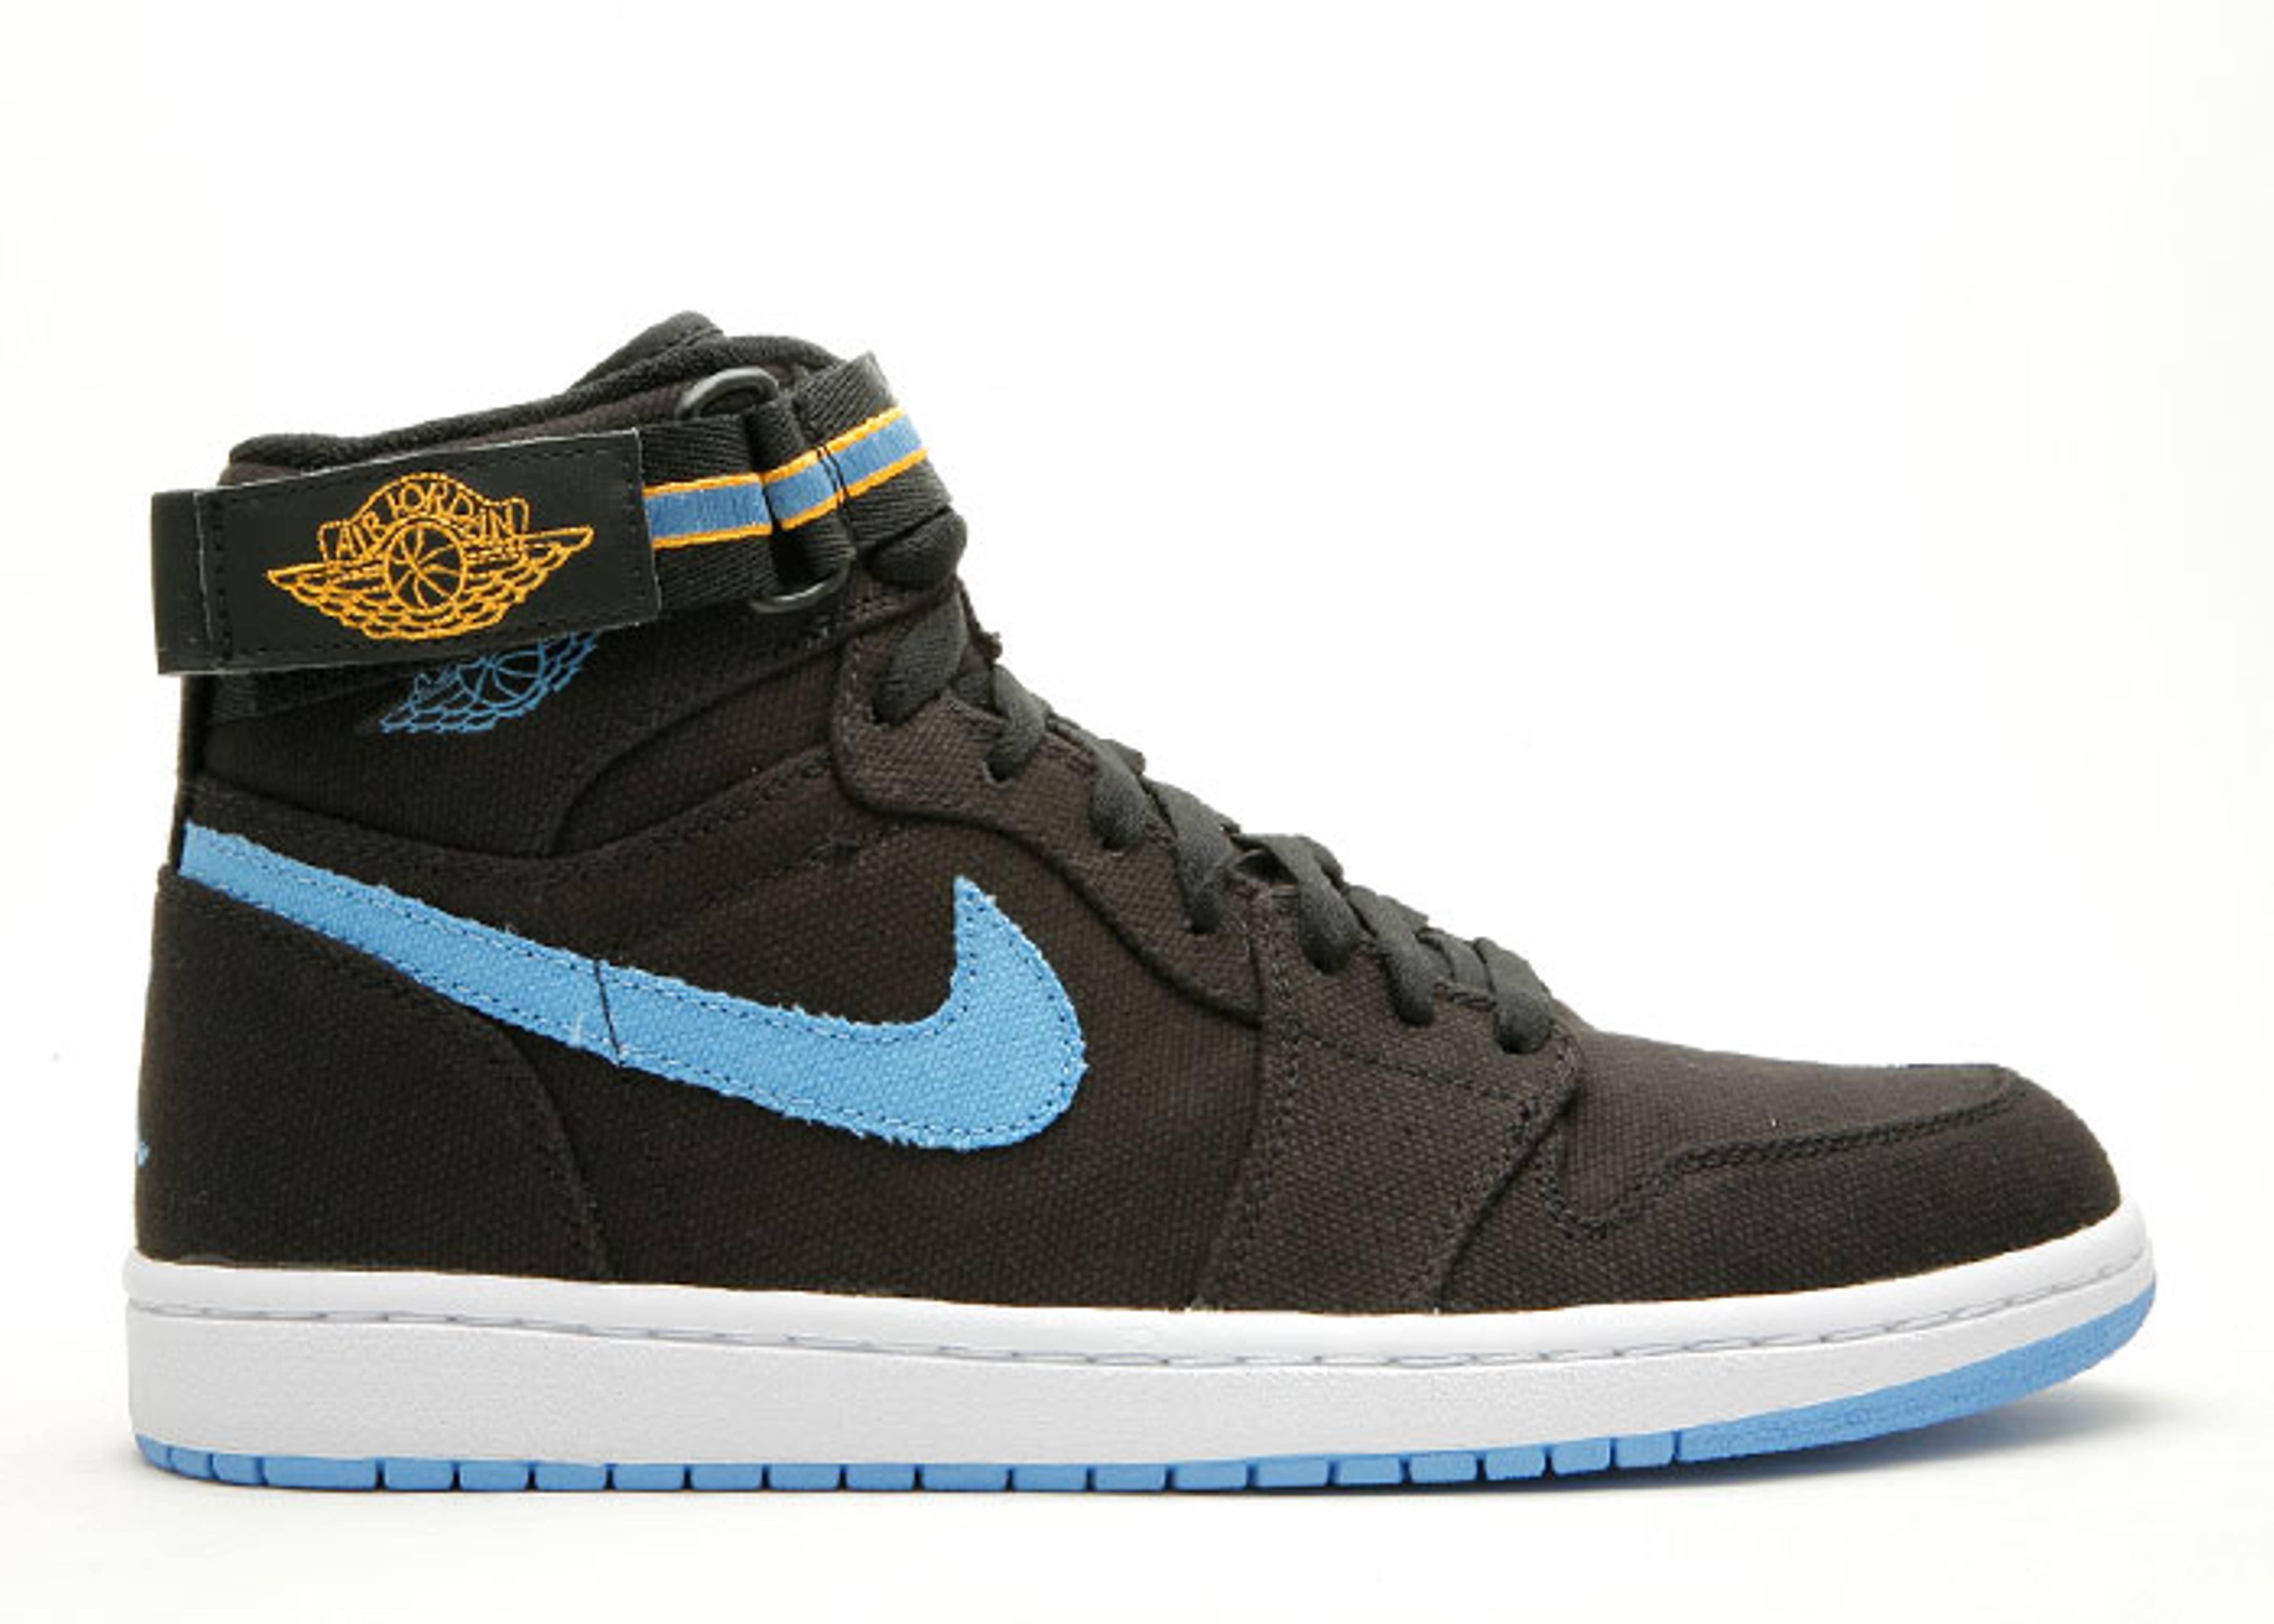 lowest price 06553 184a9 Air Jordan 1 High Strap - Air Jordan - 342132 041 - black ...